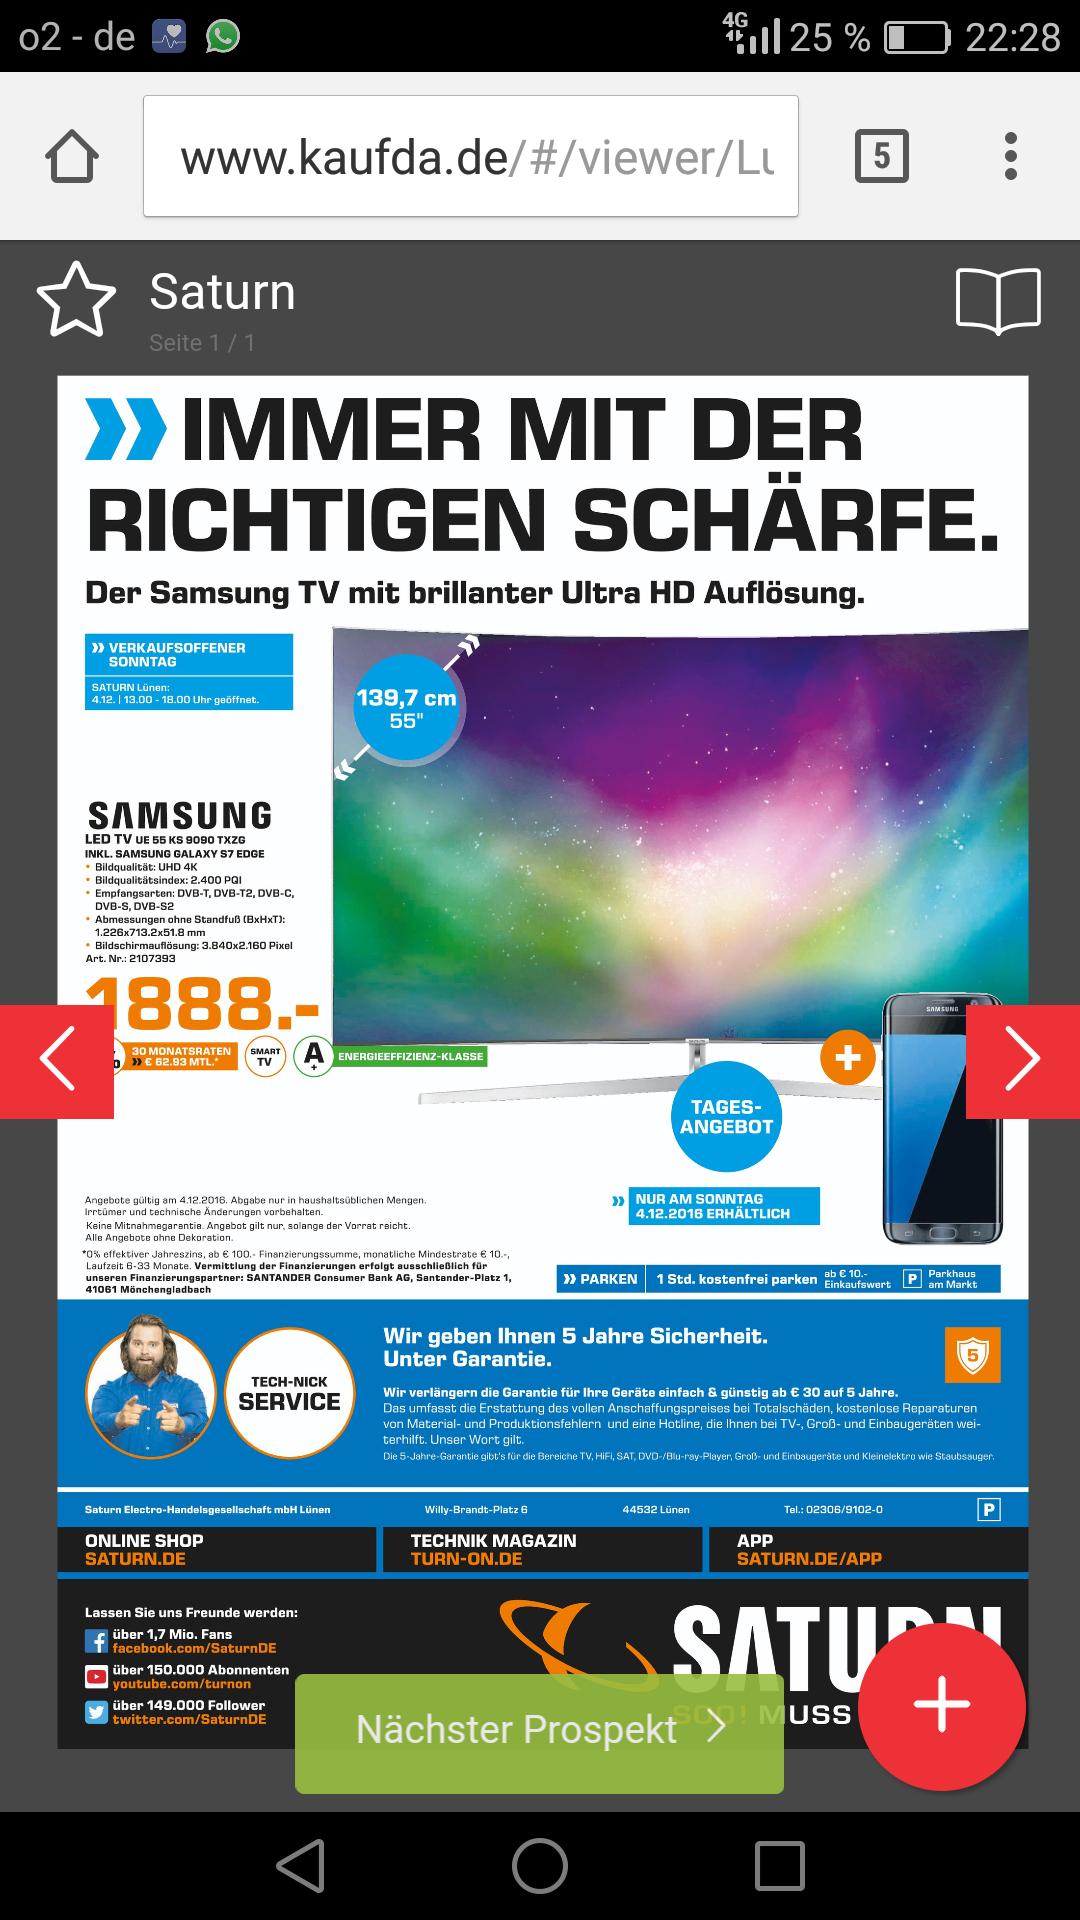 [Lünen] Samsung UE55kS9090 mit S7 Edge